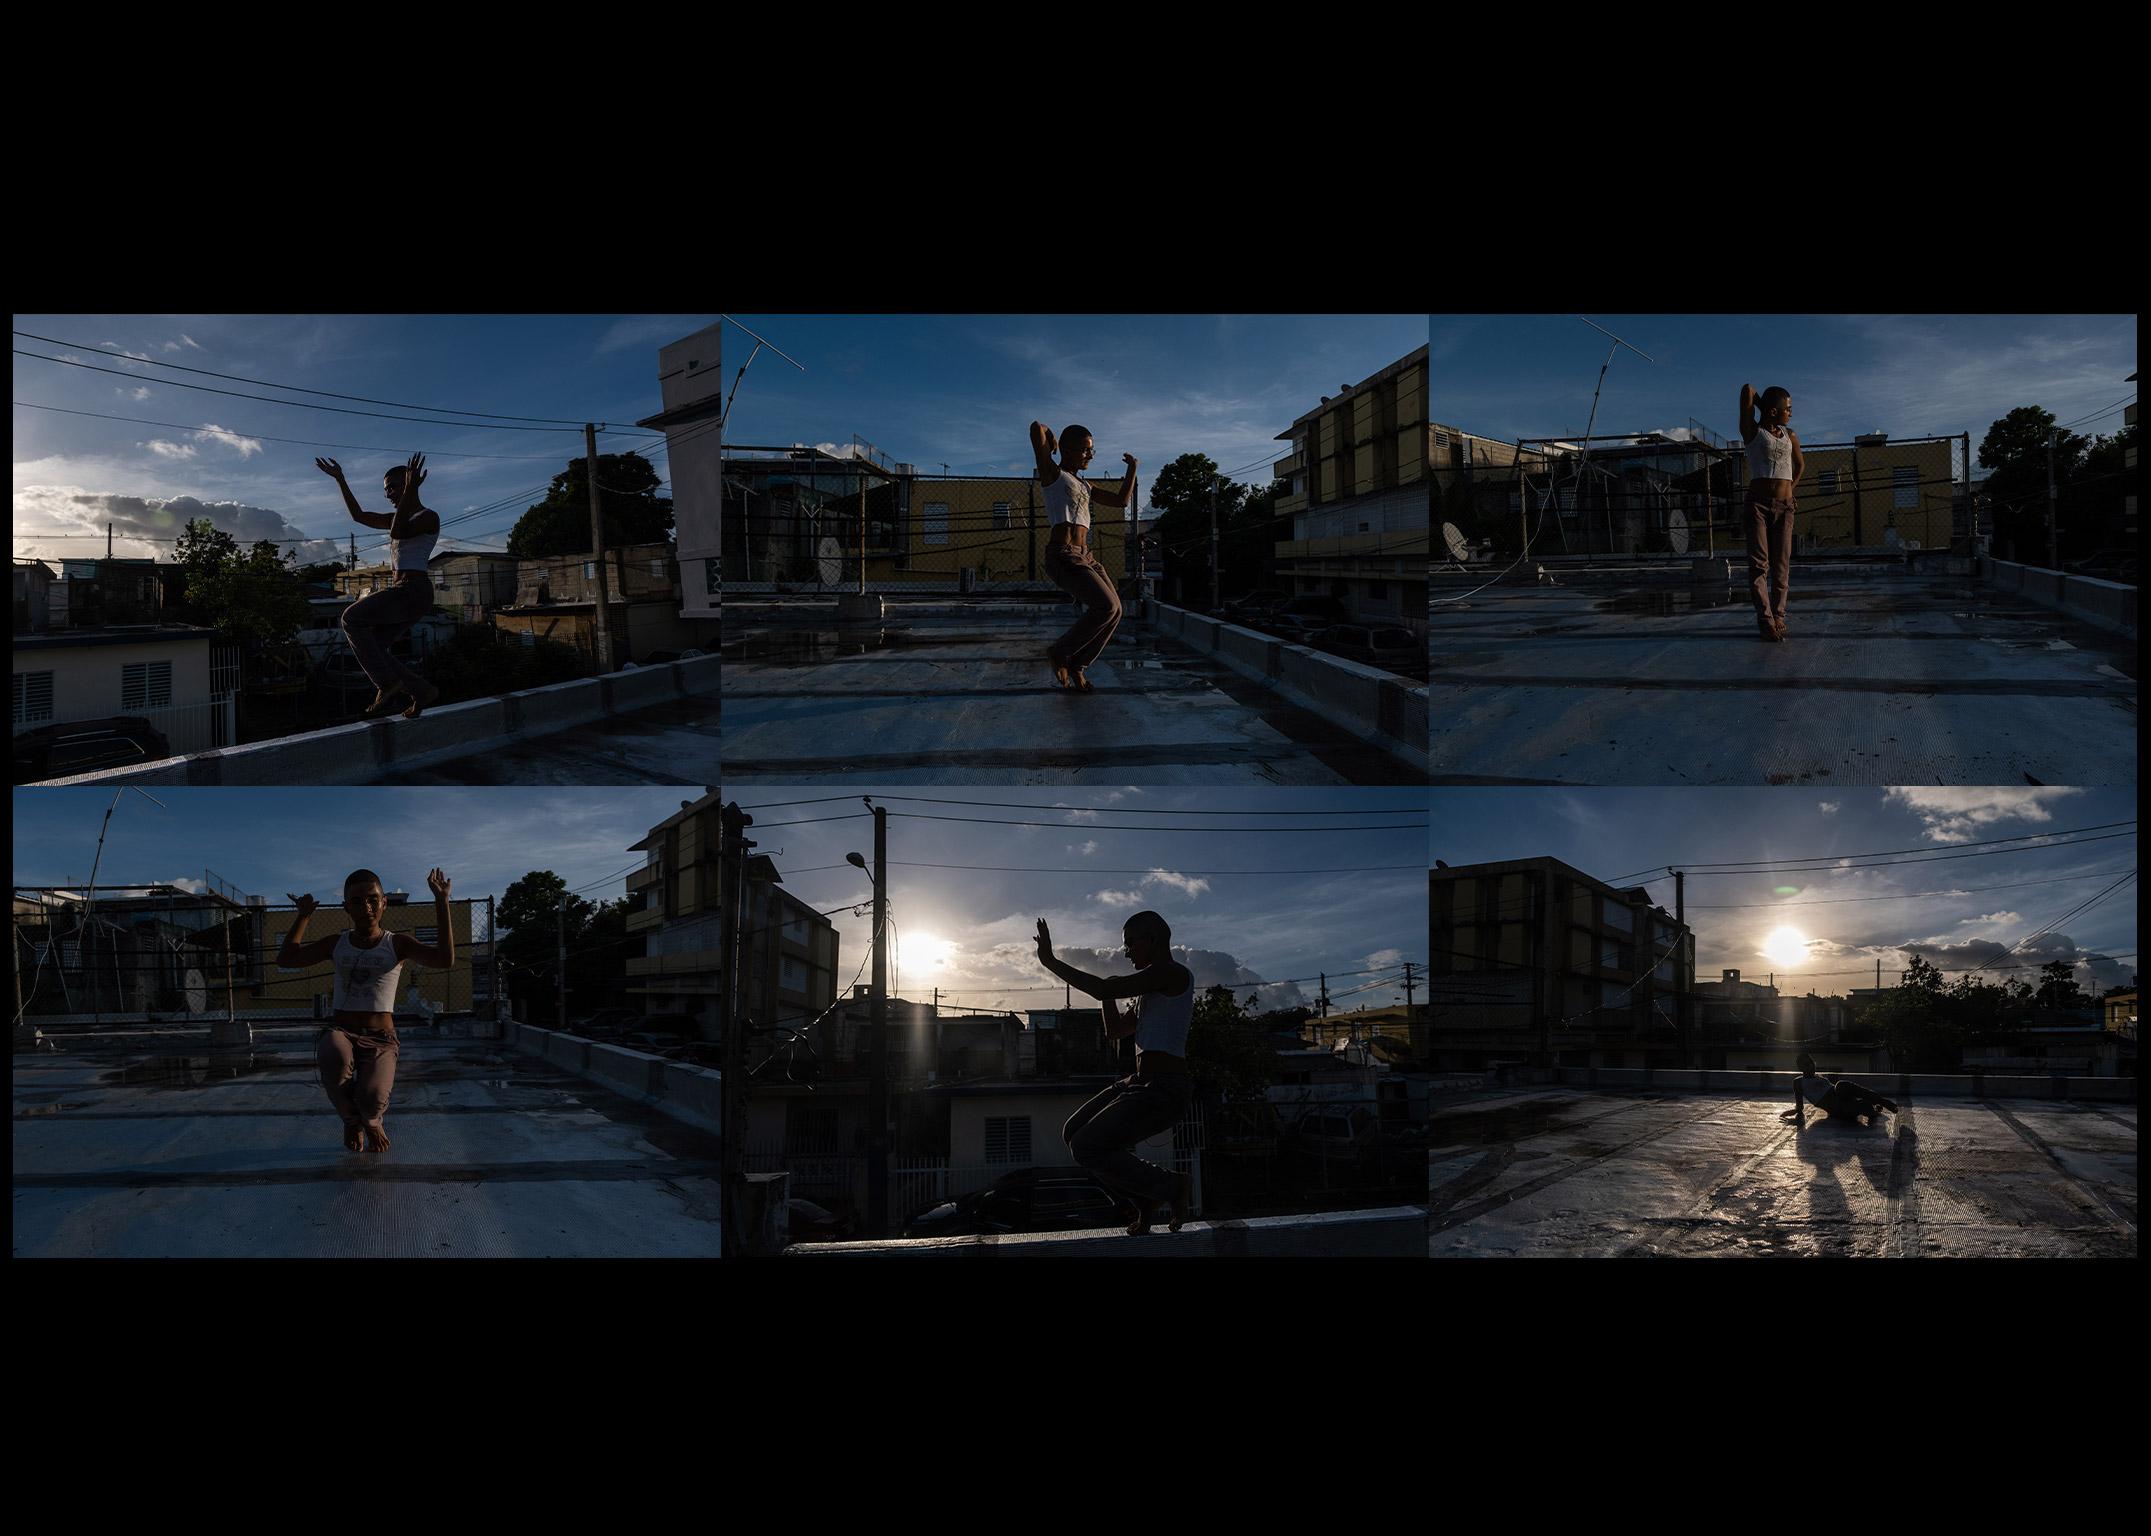 Beibijavi, 22, practices voguing on the rooftop of their neighbors' apartment in Rio Piedras, San Juan, Puerto Rico.